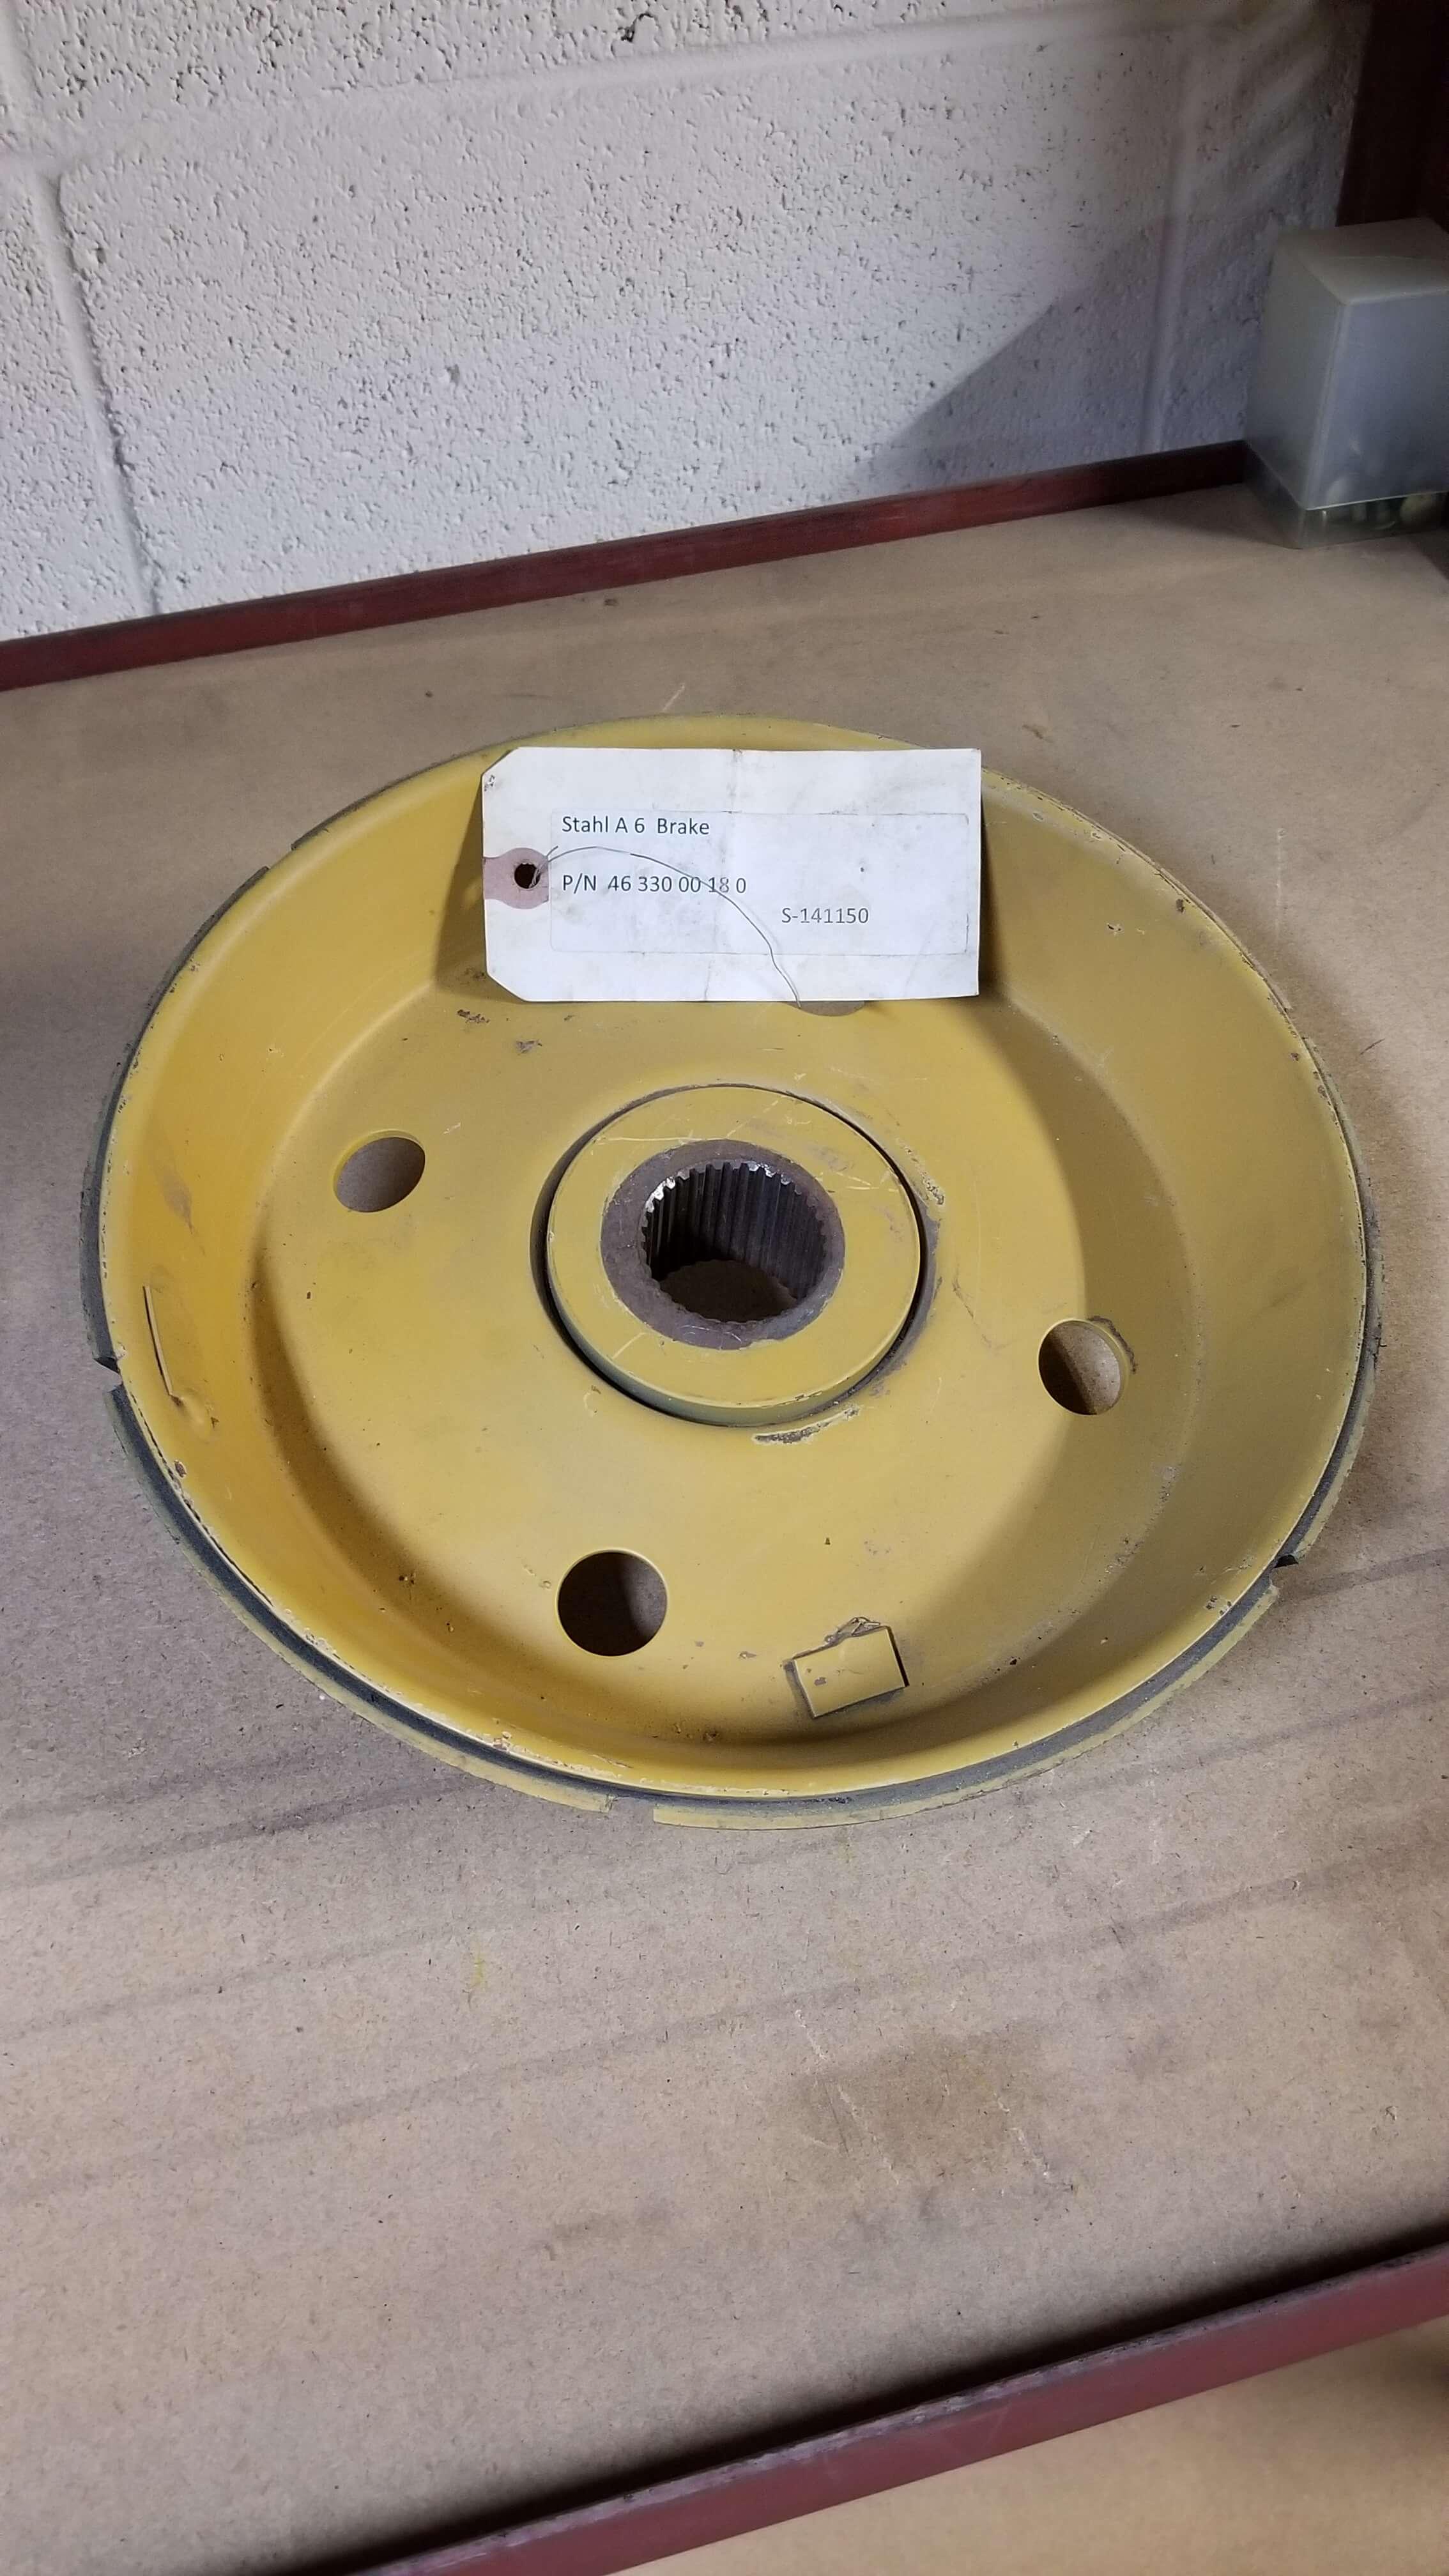 Stahl A6 Brake Disc  P/N: 46 330 00 180  $2650.00